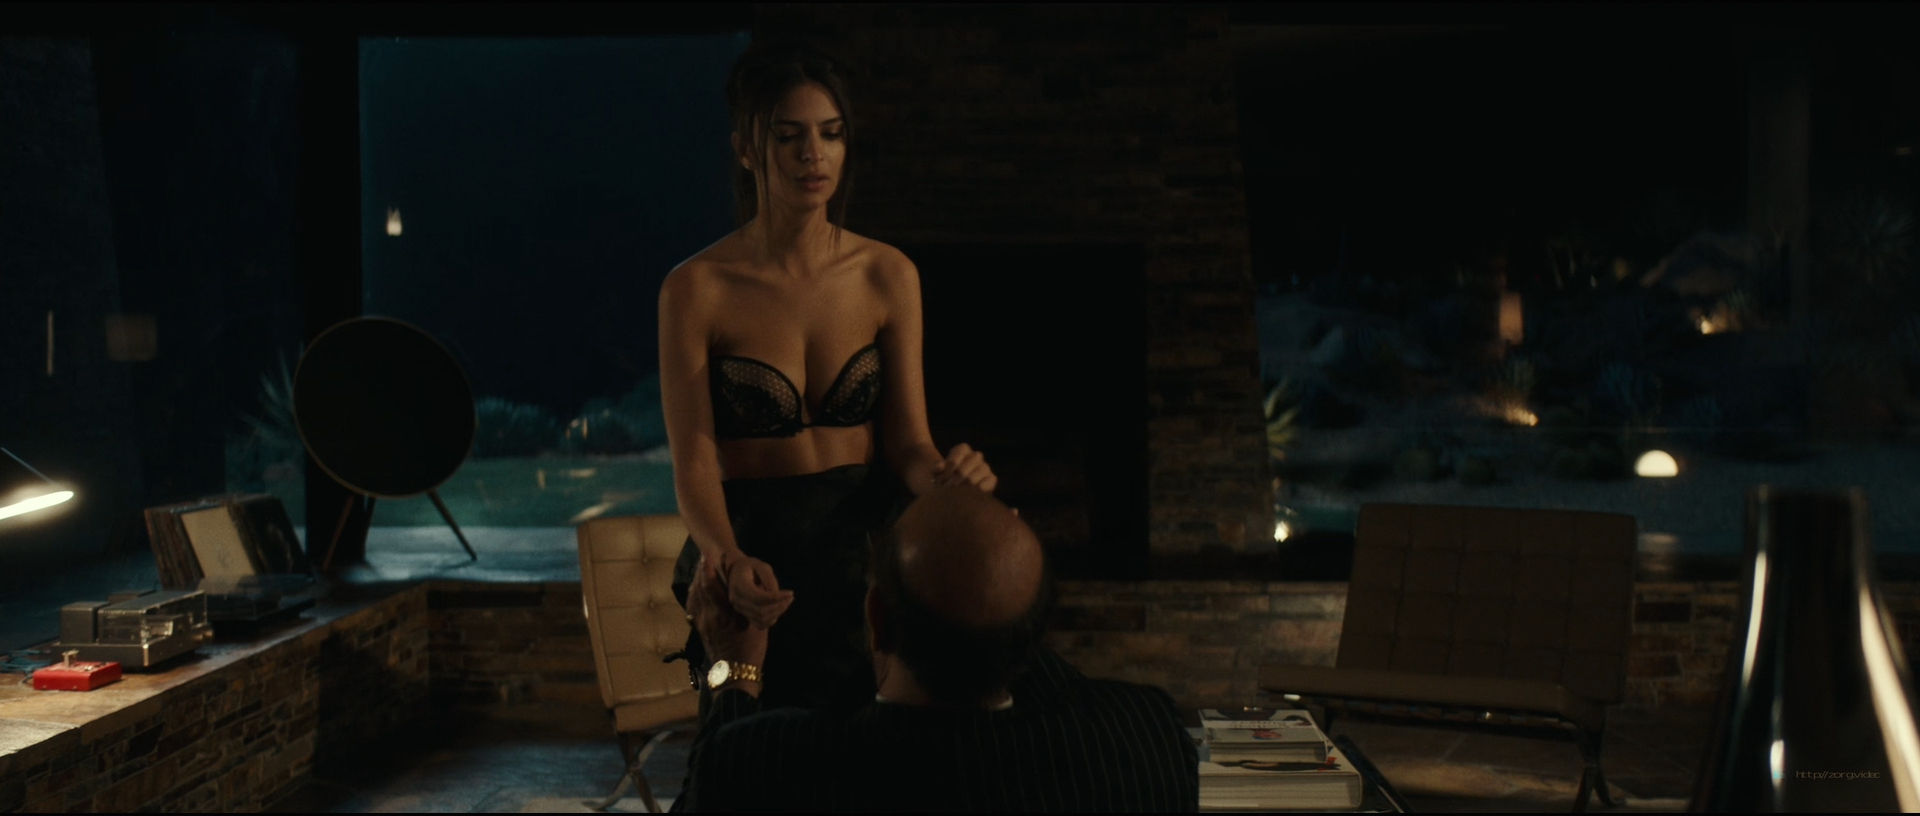 Emily Ratajkowski hot sideboob - Lying and Stealing (2019) 1080p WEB (5)